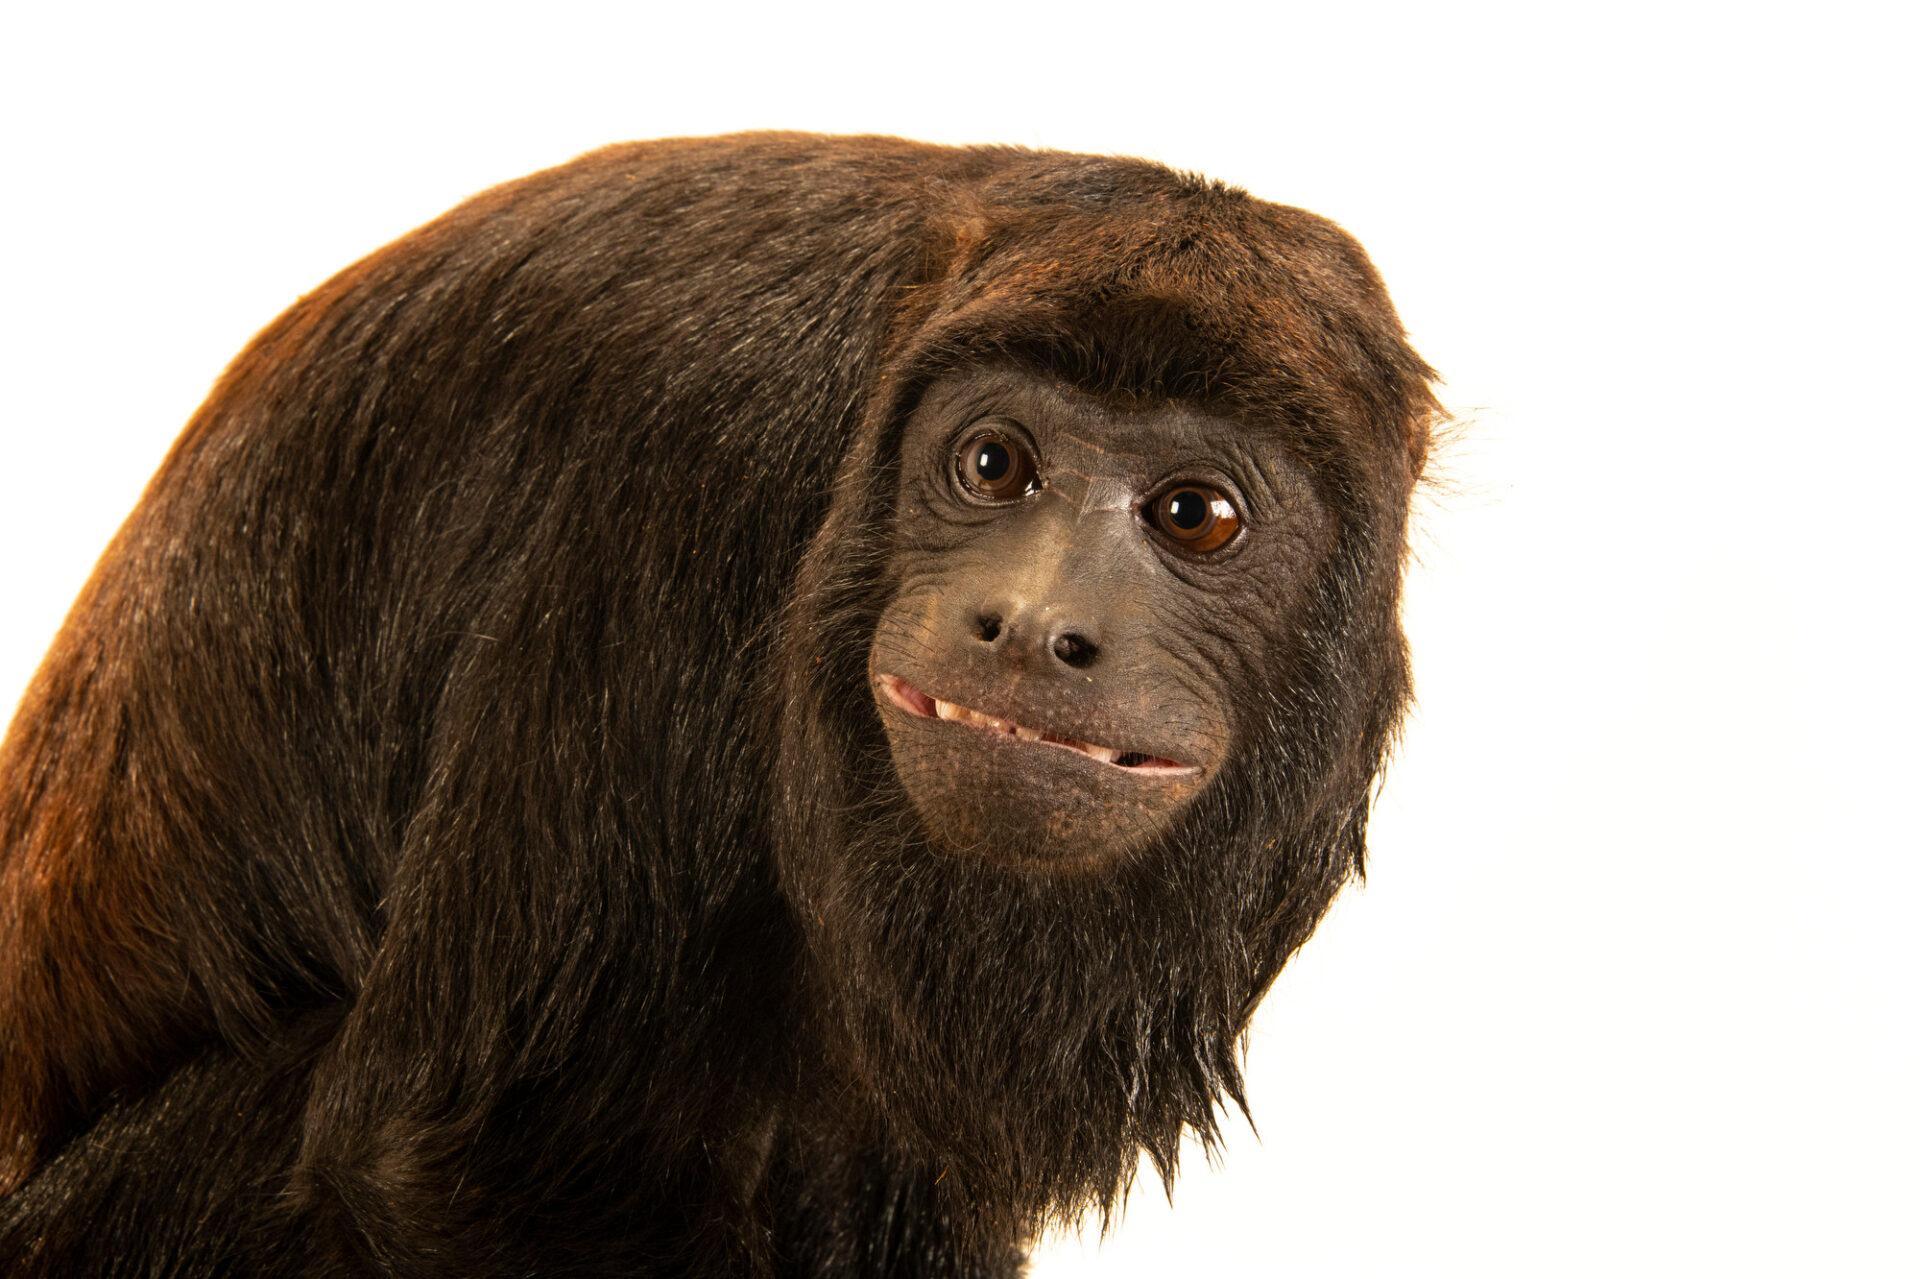 Photo: A male red-handed howler monkey (Alouatta belzebul) at Fundacao Jardim Zoologico de Brasilia.